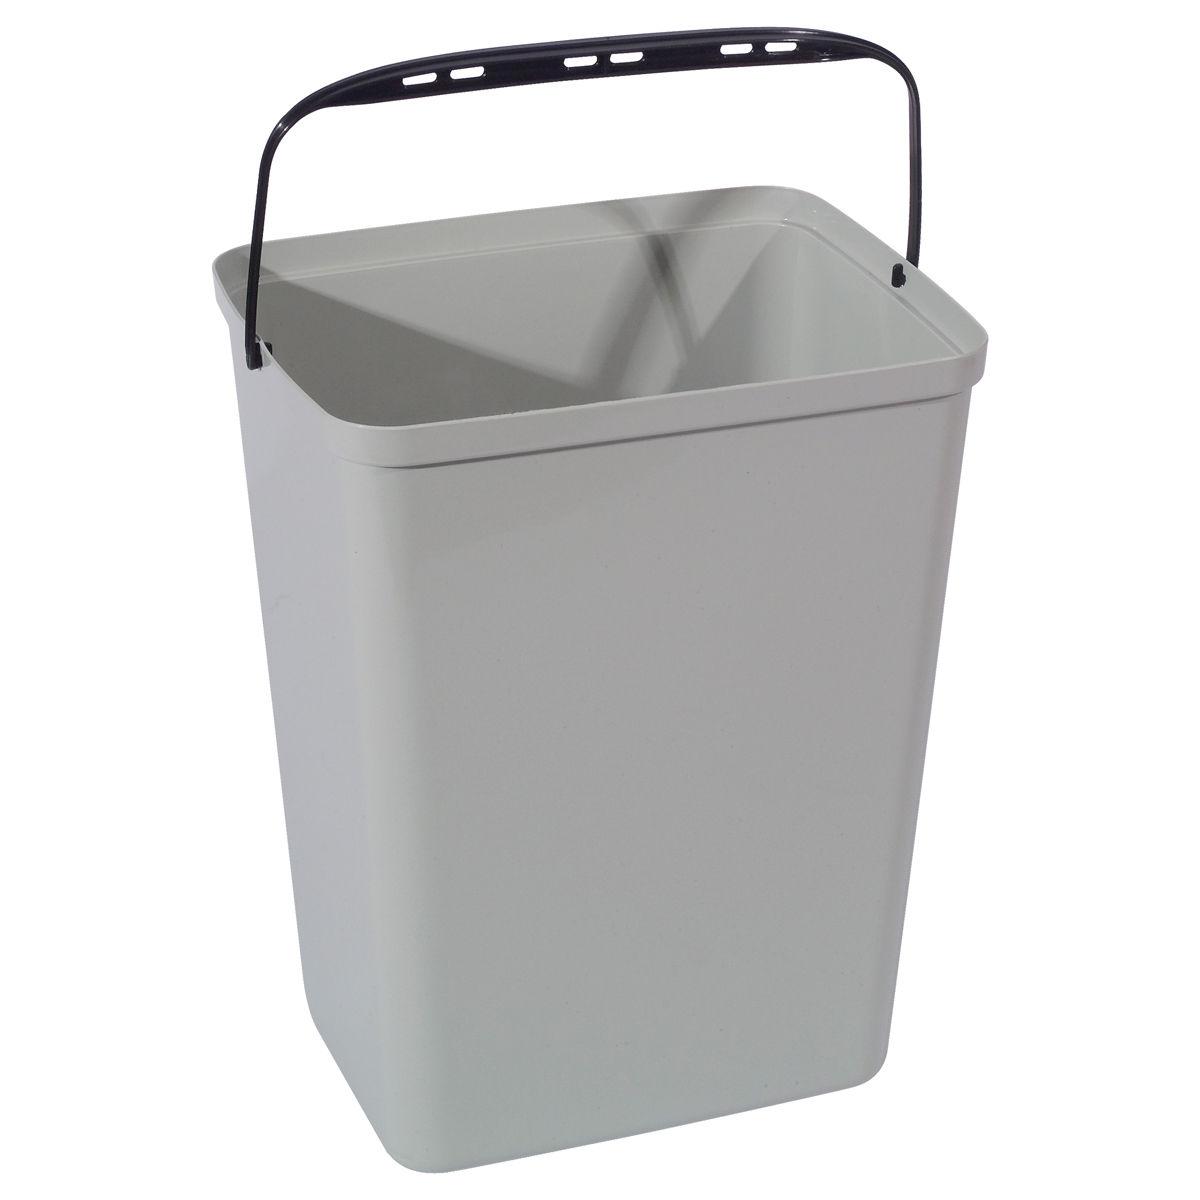 Kit de 4 cubos para reciclaje for Cubos de reciclaje ikea